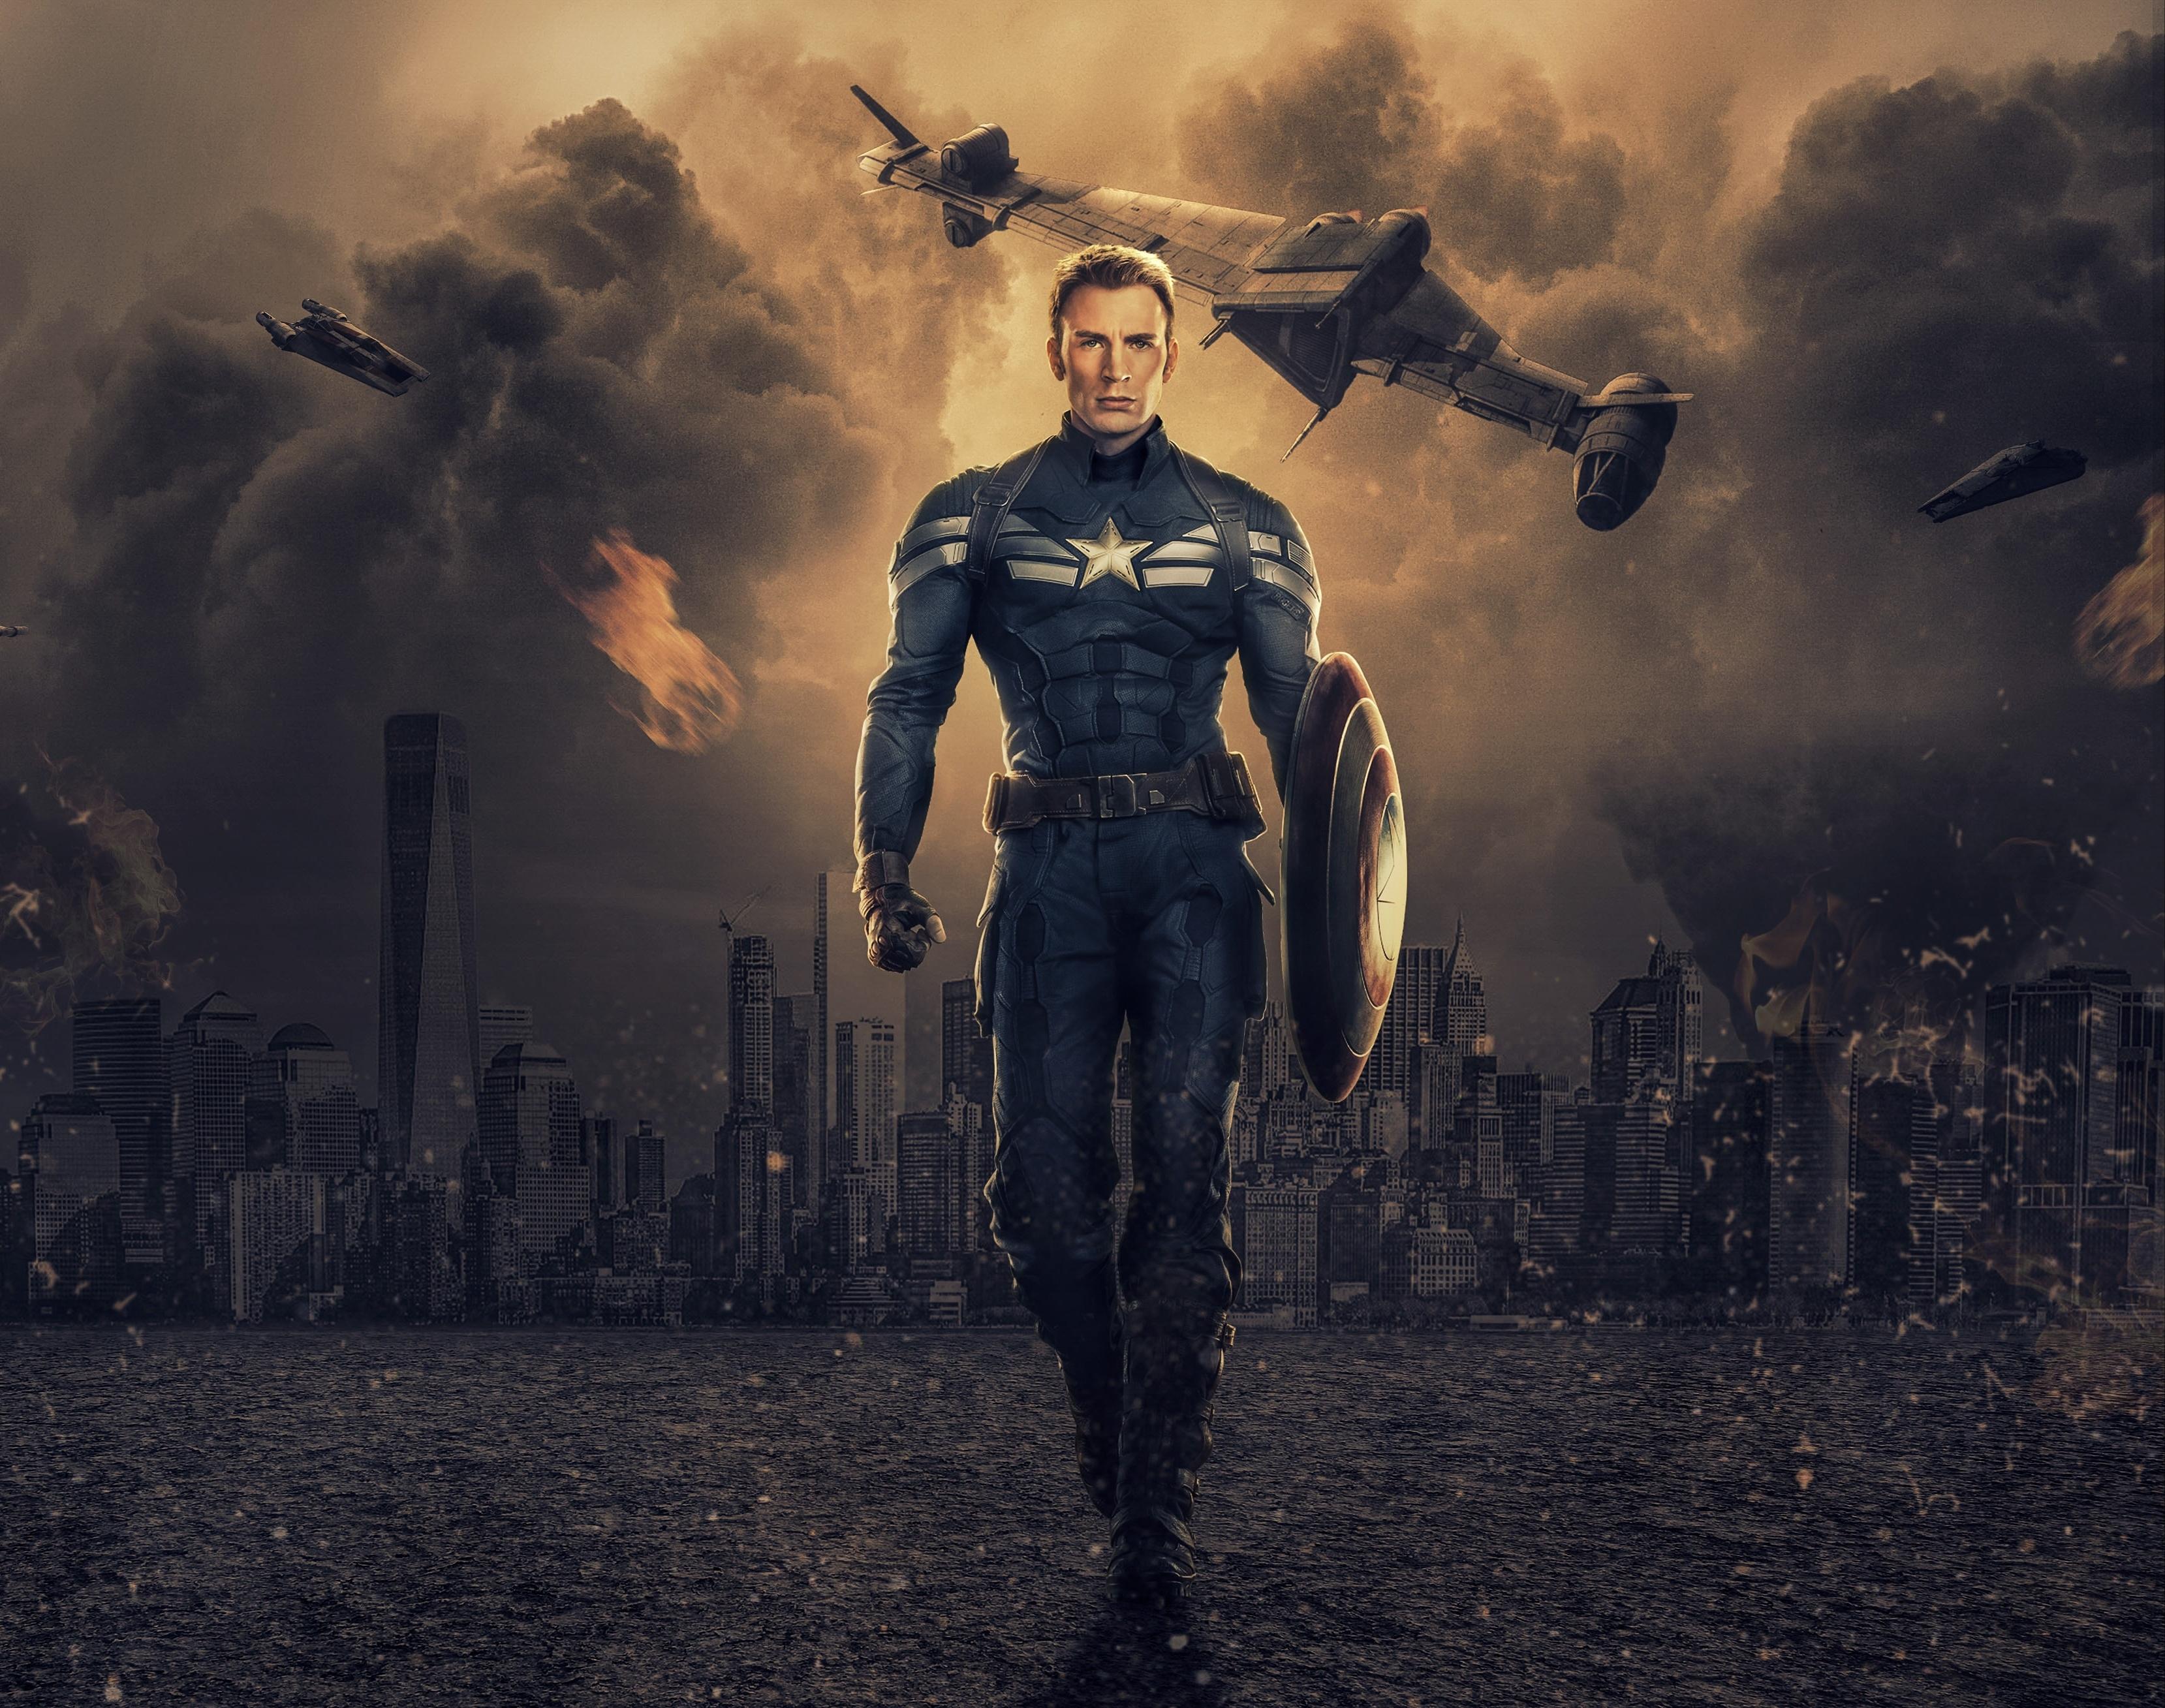 2932x2932 Chris Evans As Captain America Ipad Pro Retina